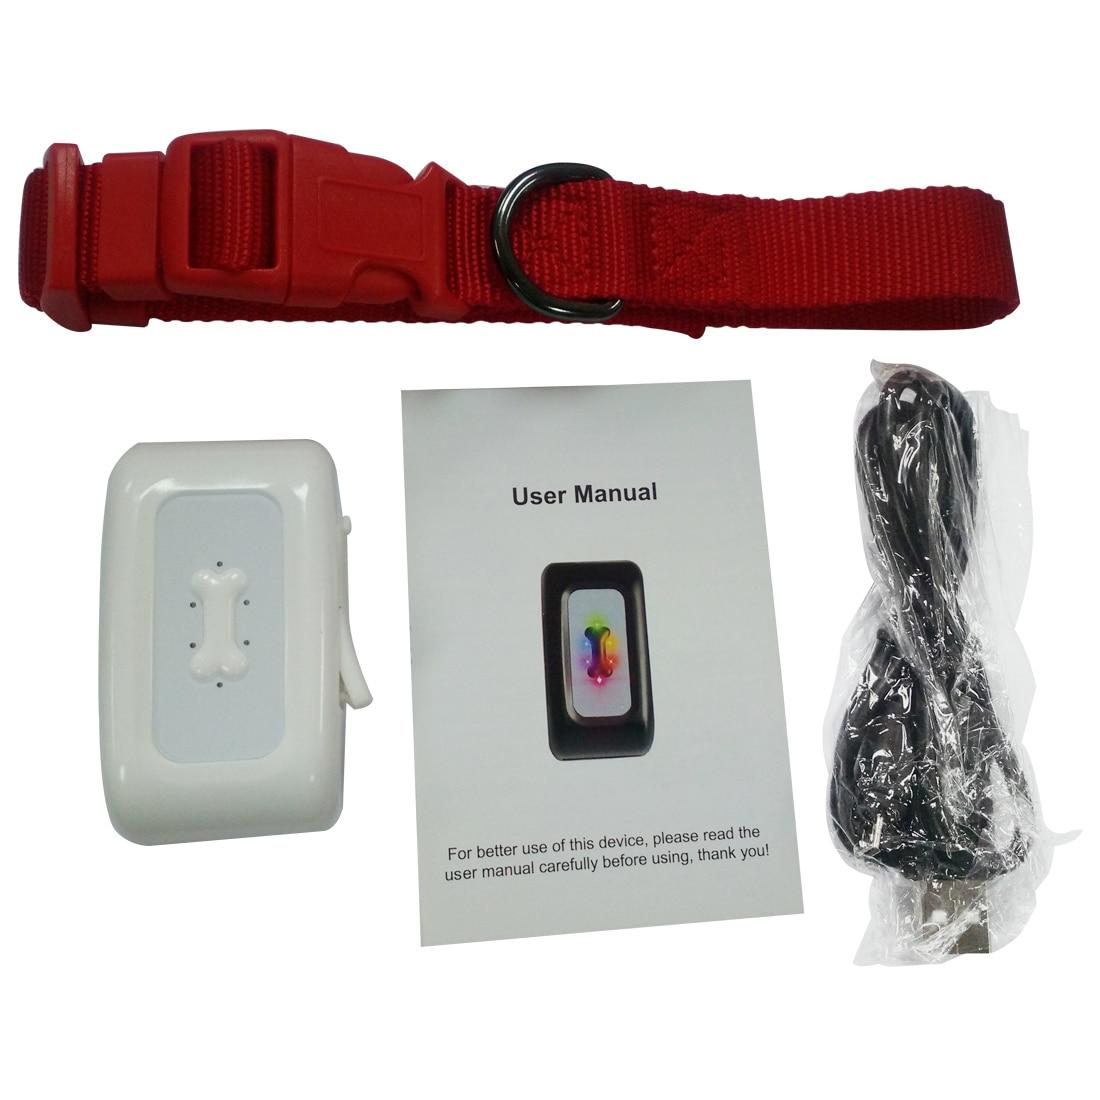 MOOL GPS locator intelligent pet dodge light precision 5 m pet gps locator store locator